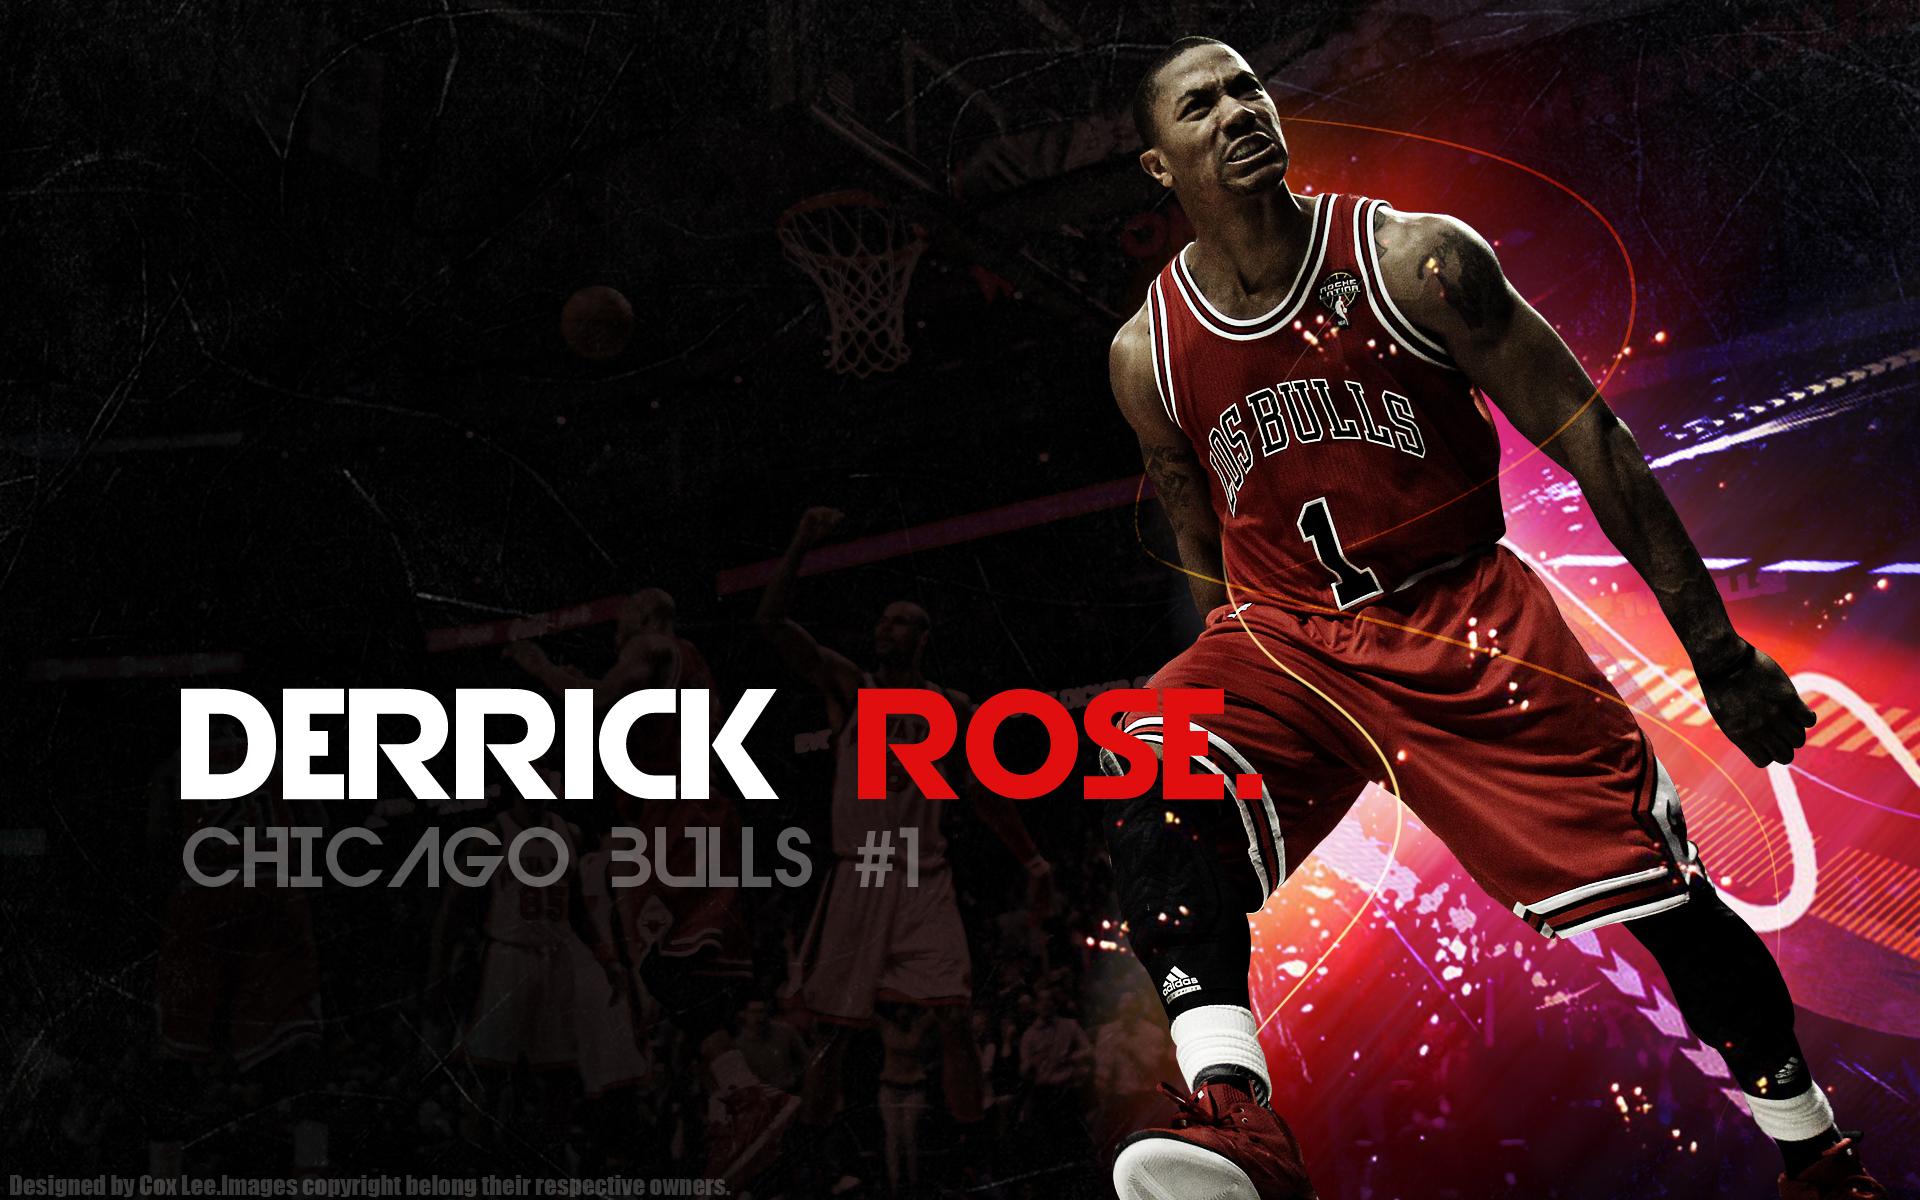 d rose wallpaper 901476